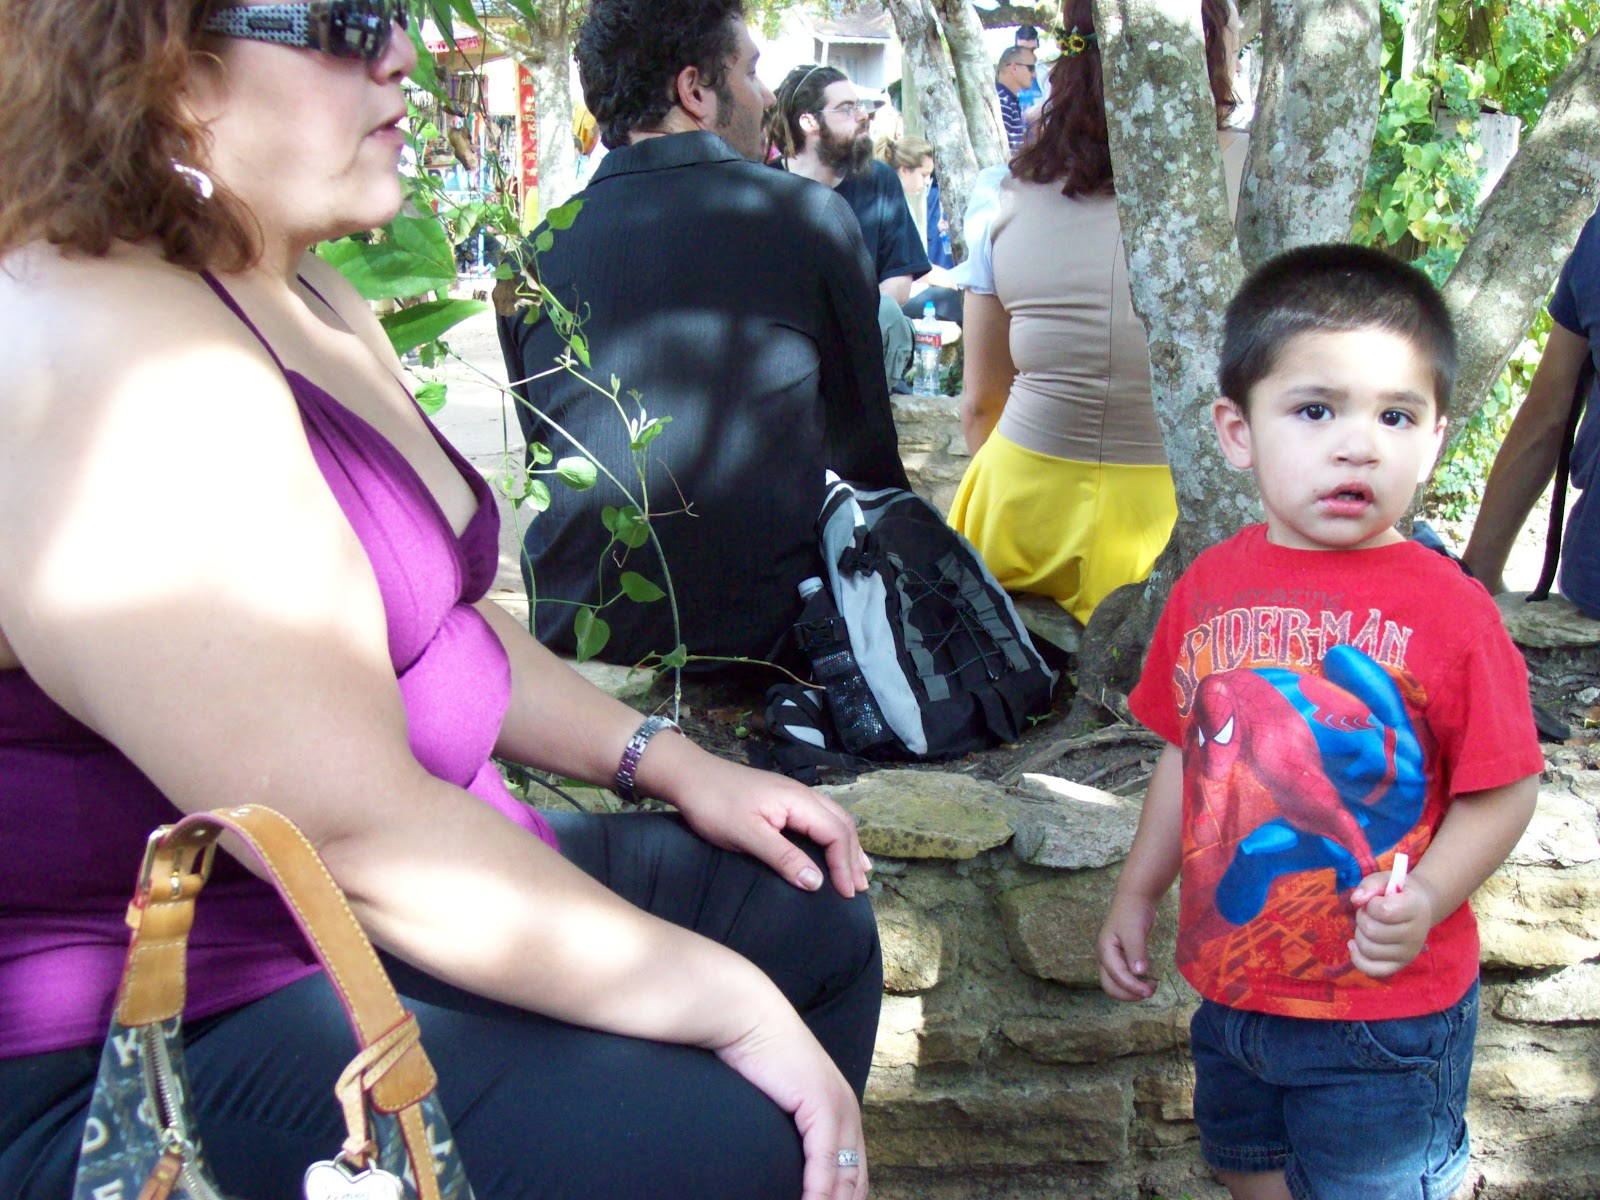 Texas Renaissance Festival - 101_5784.JPG